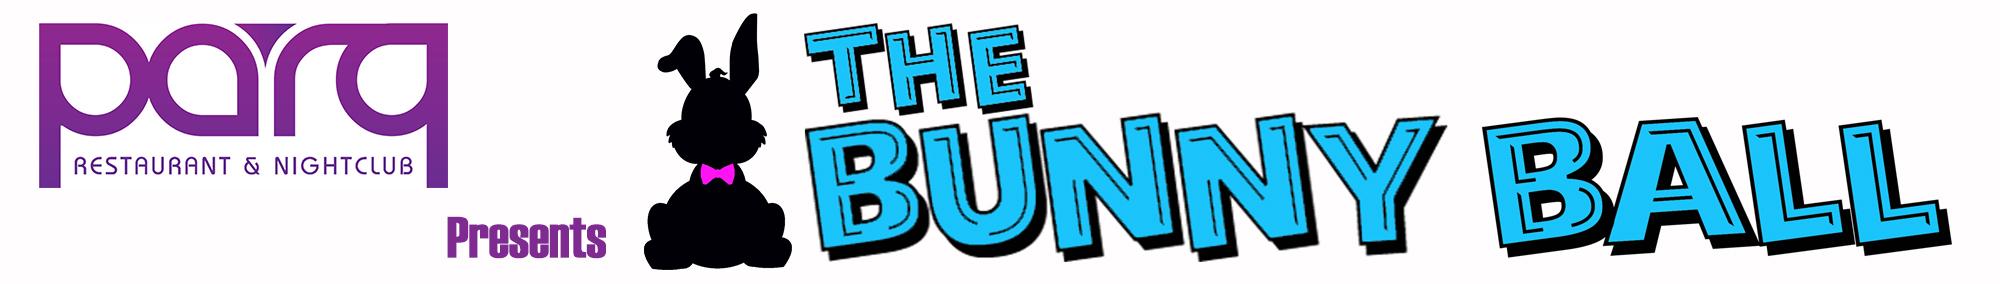 Bunny Ball 2019 PARQ Banner